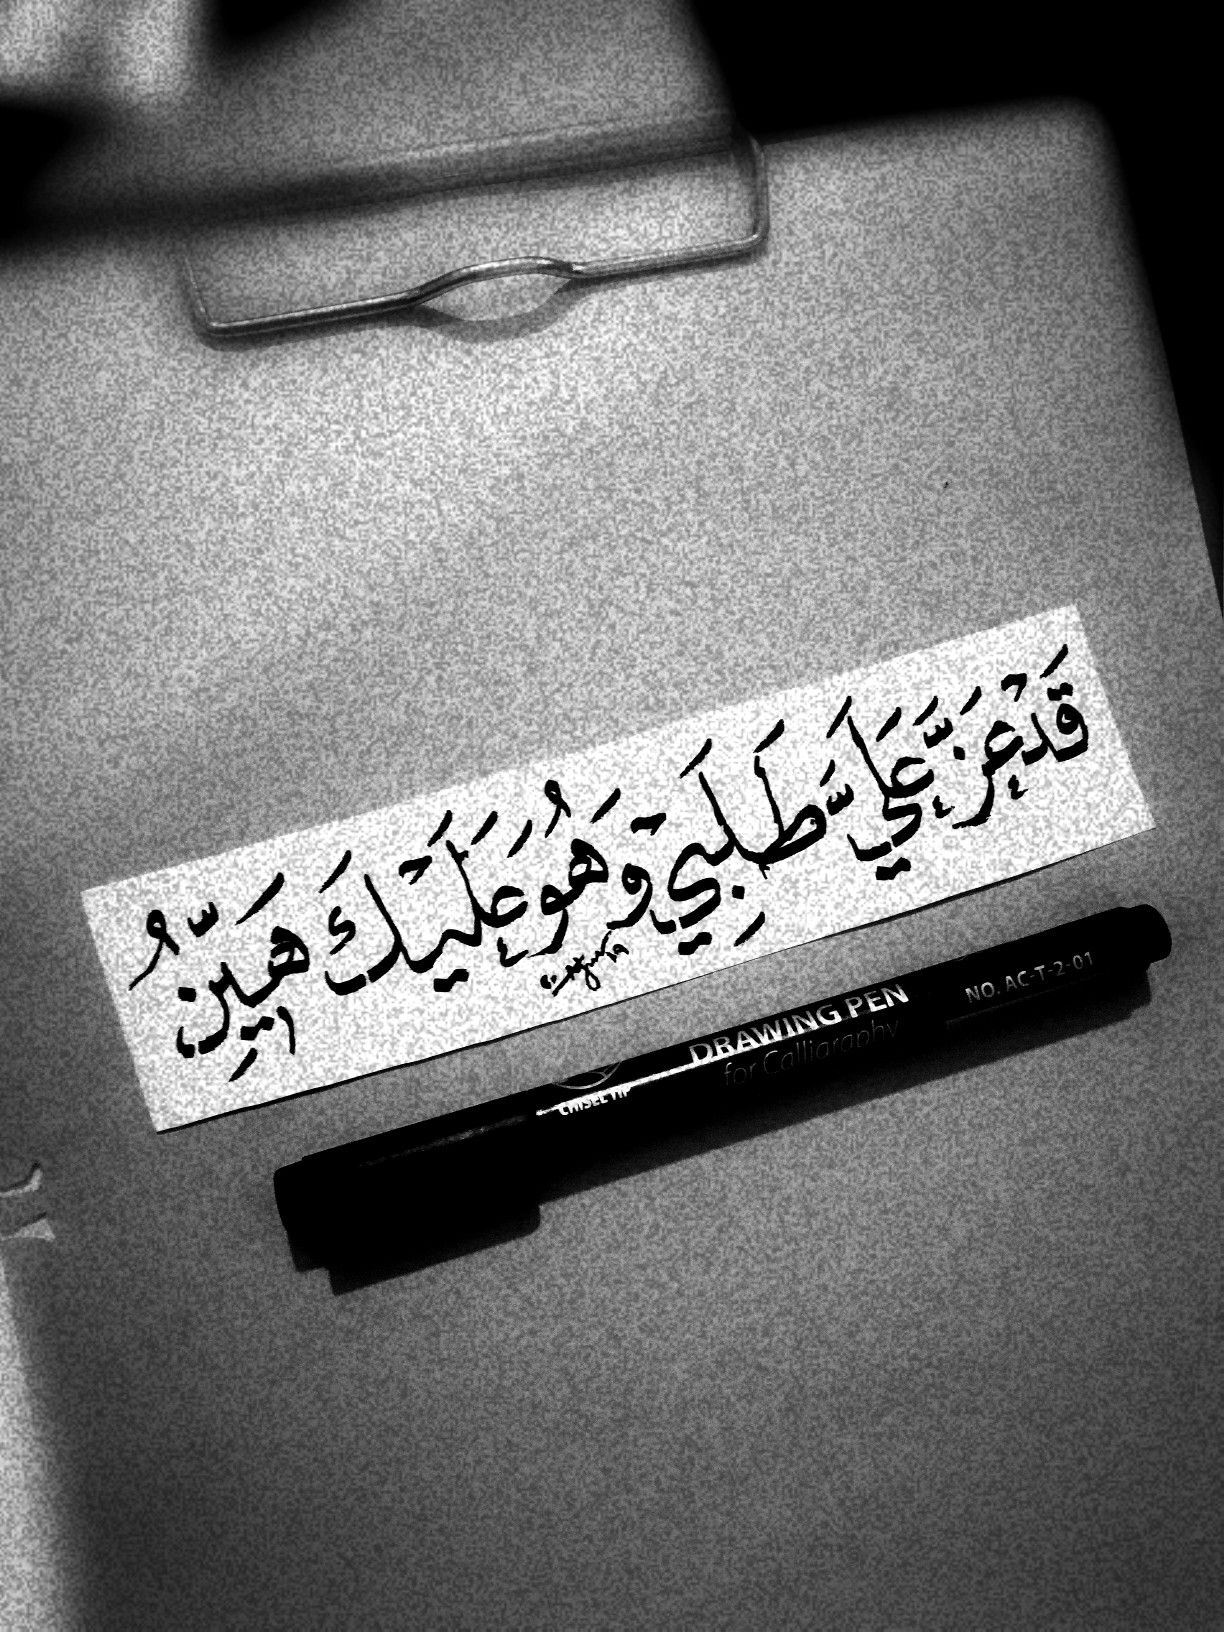 وقد عز عليا طلبي وهو عليك هين Photo Quotes Arabic Quotes Pen Drawing